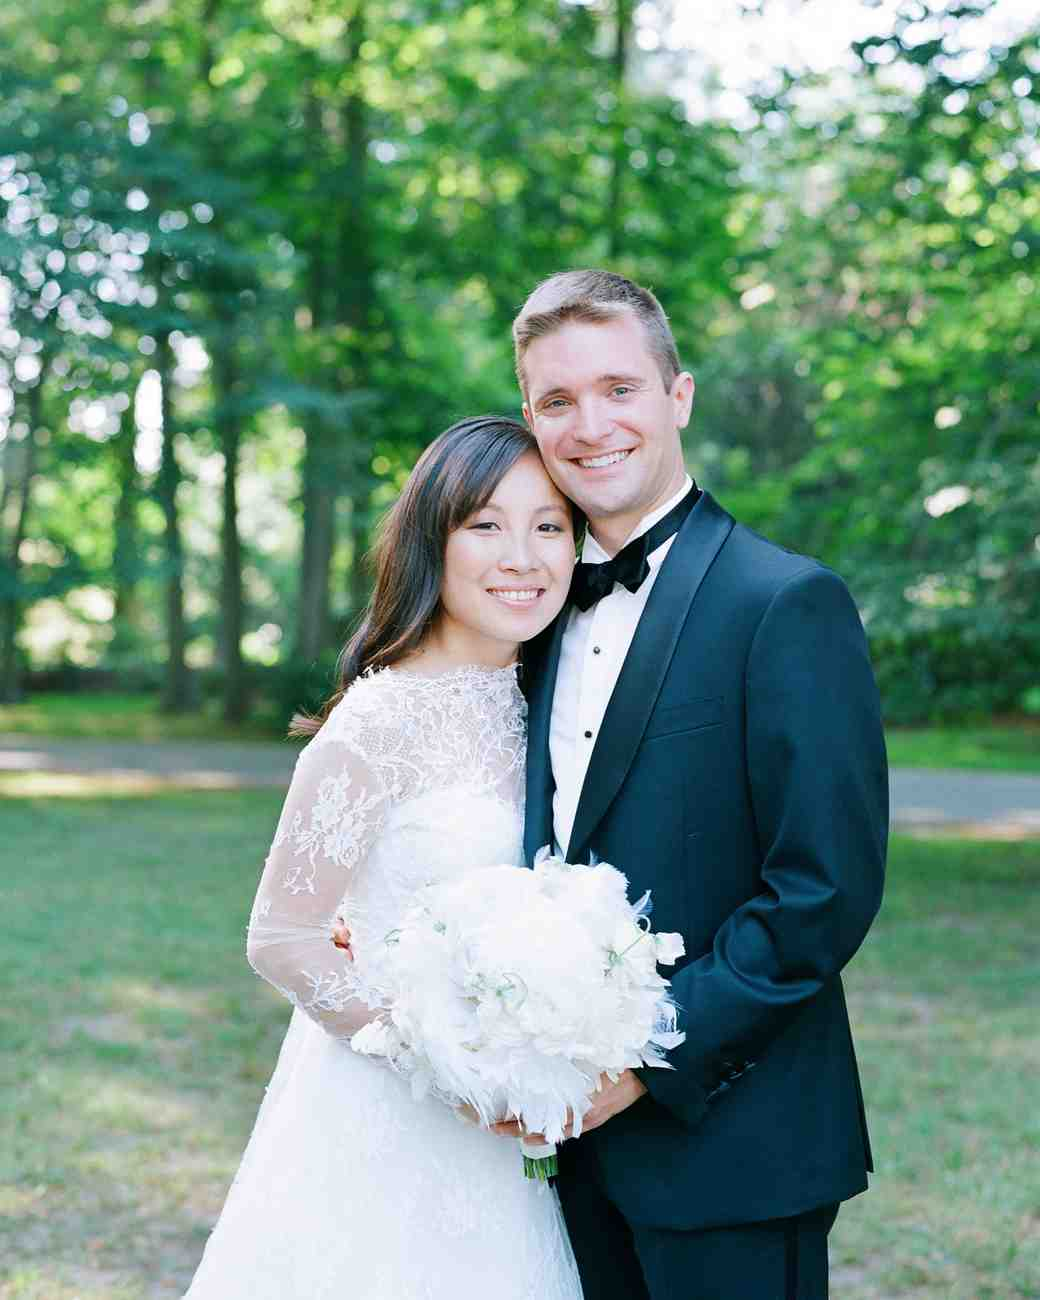 lissy-steven-wedding-newport-couple-083-elizabethmessina-s112907-0516.jpg